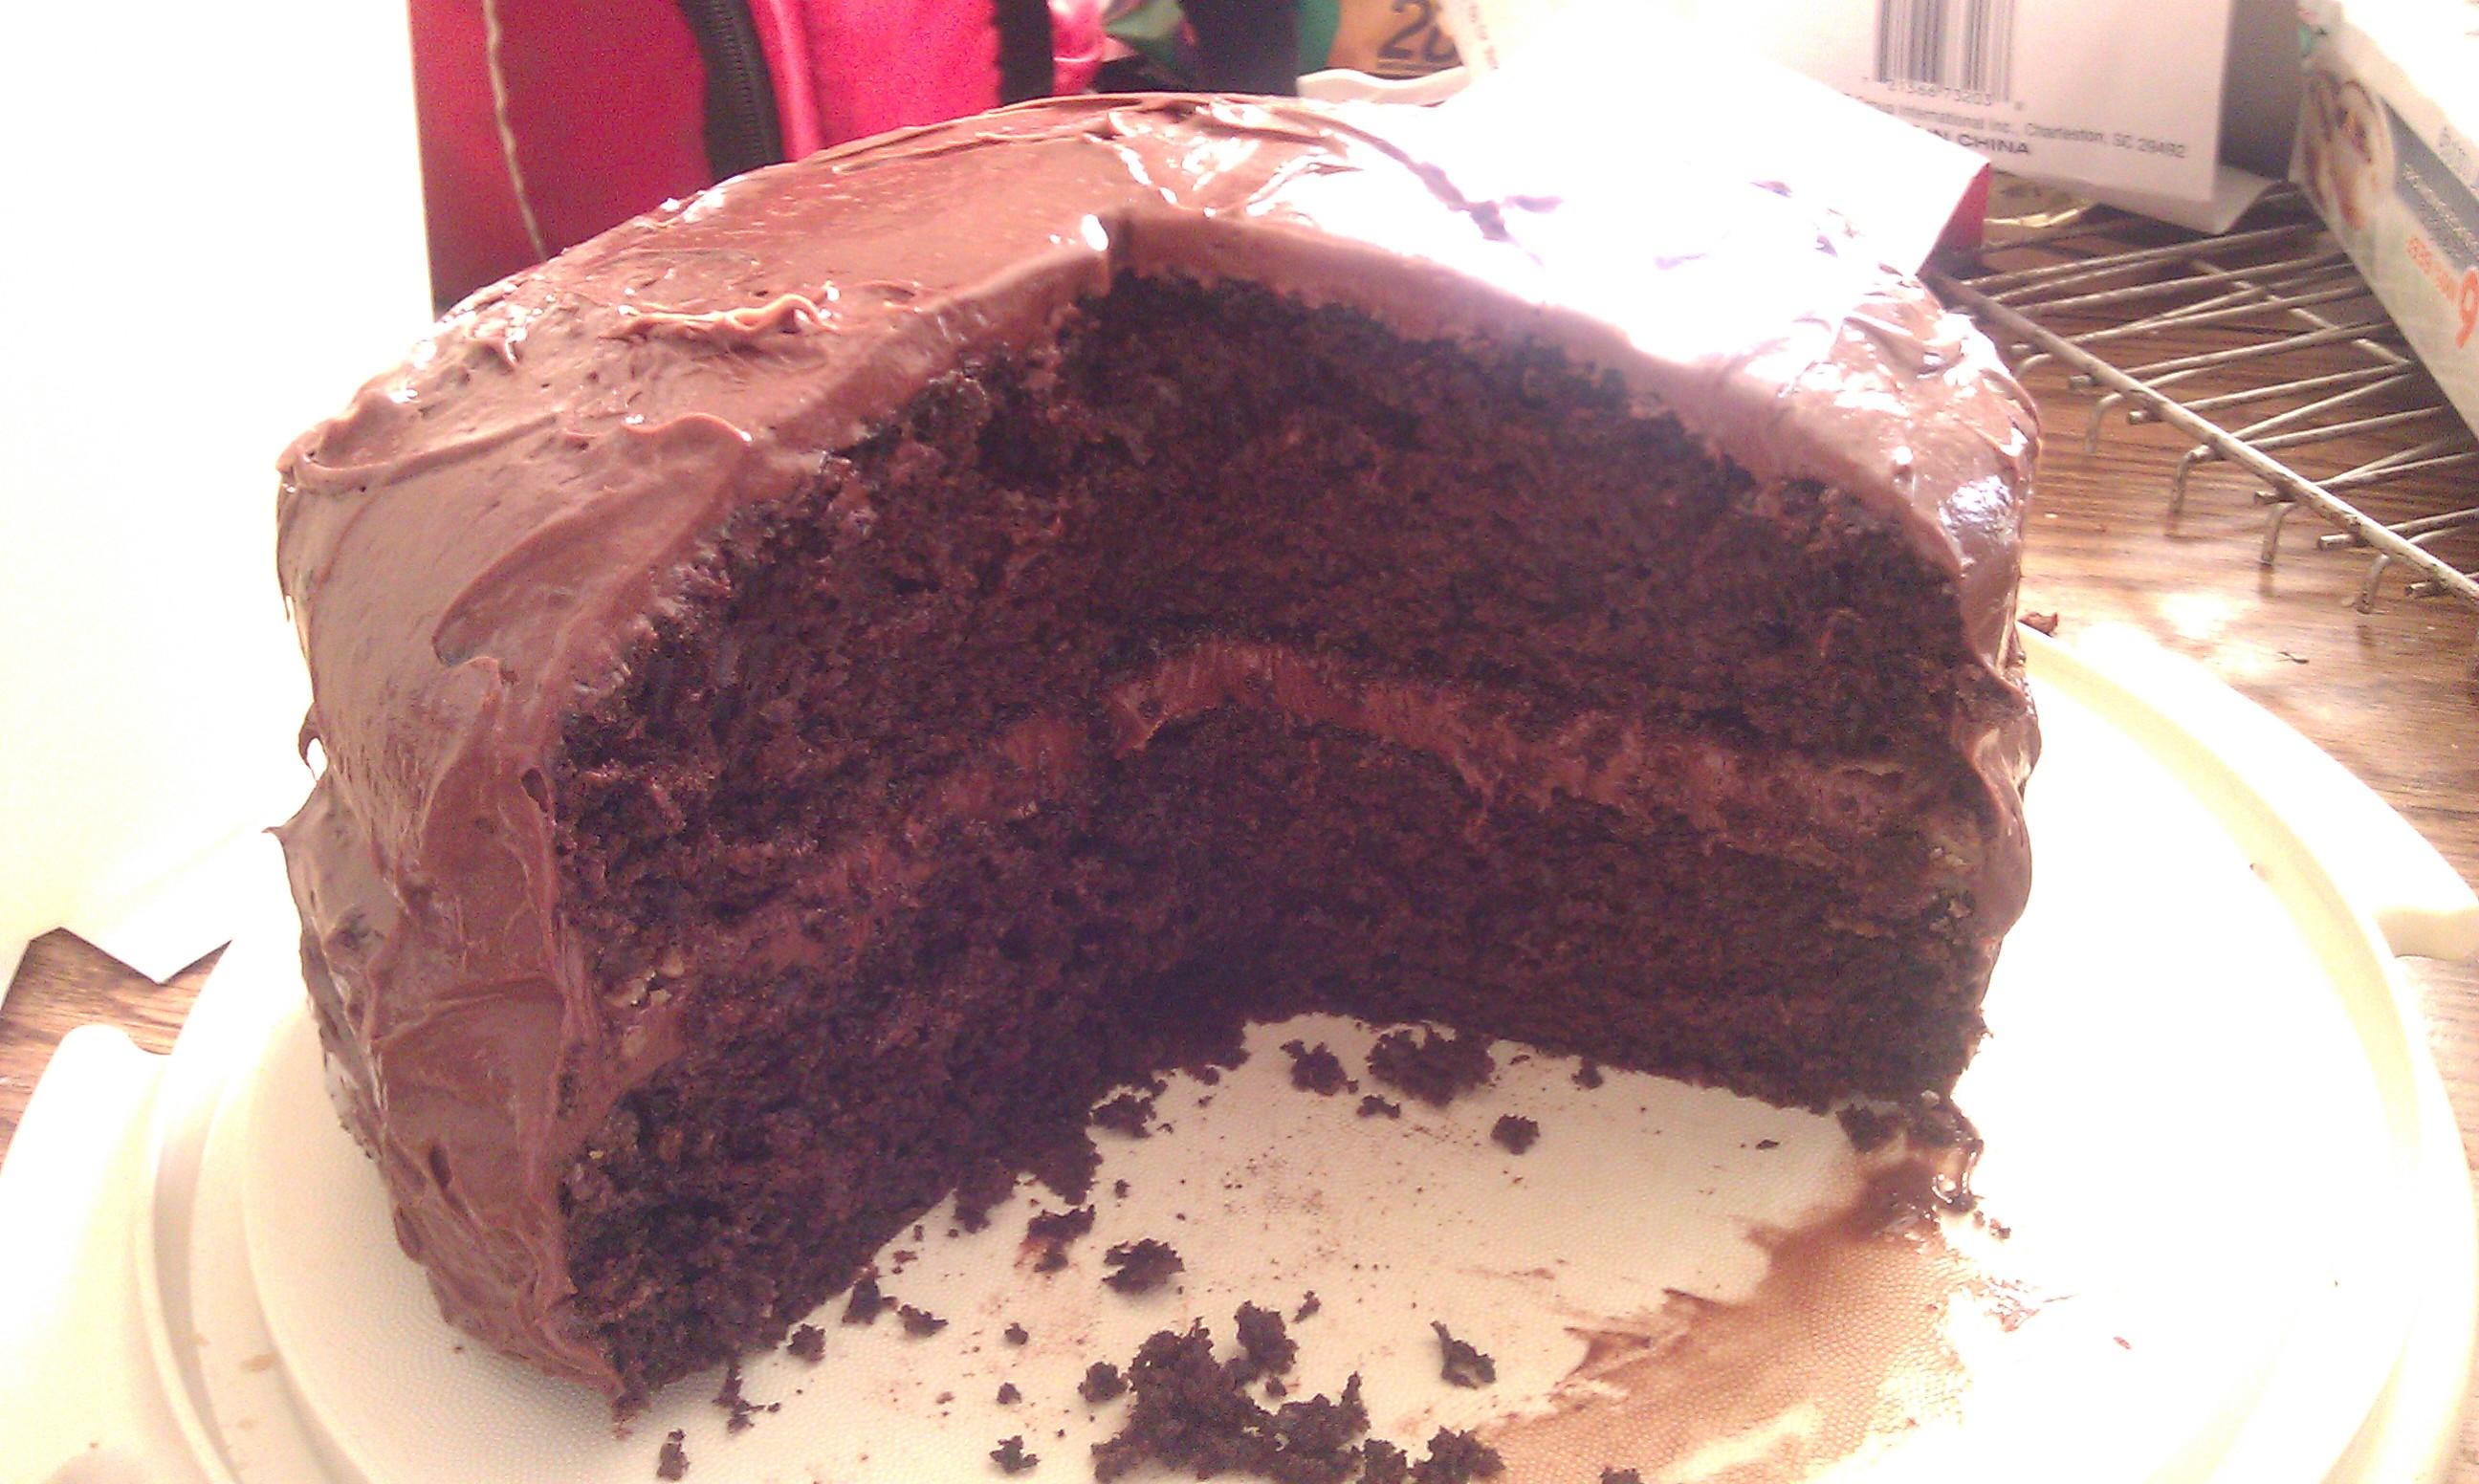 https://foodloader.net/t0xik_2011-05-11_chocolate_cake.jpg